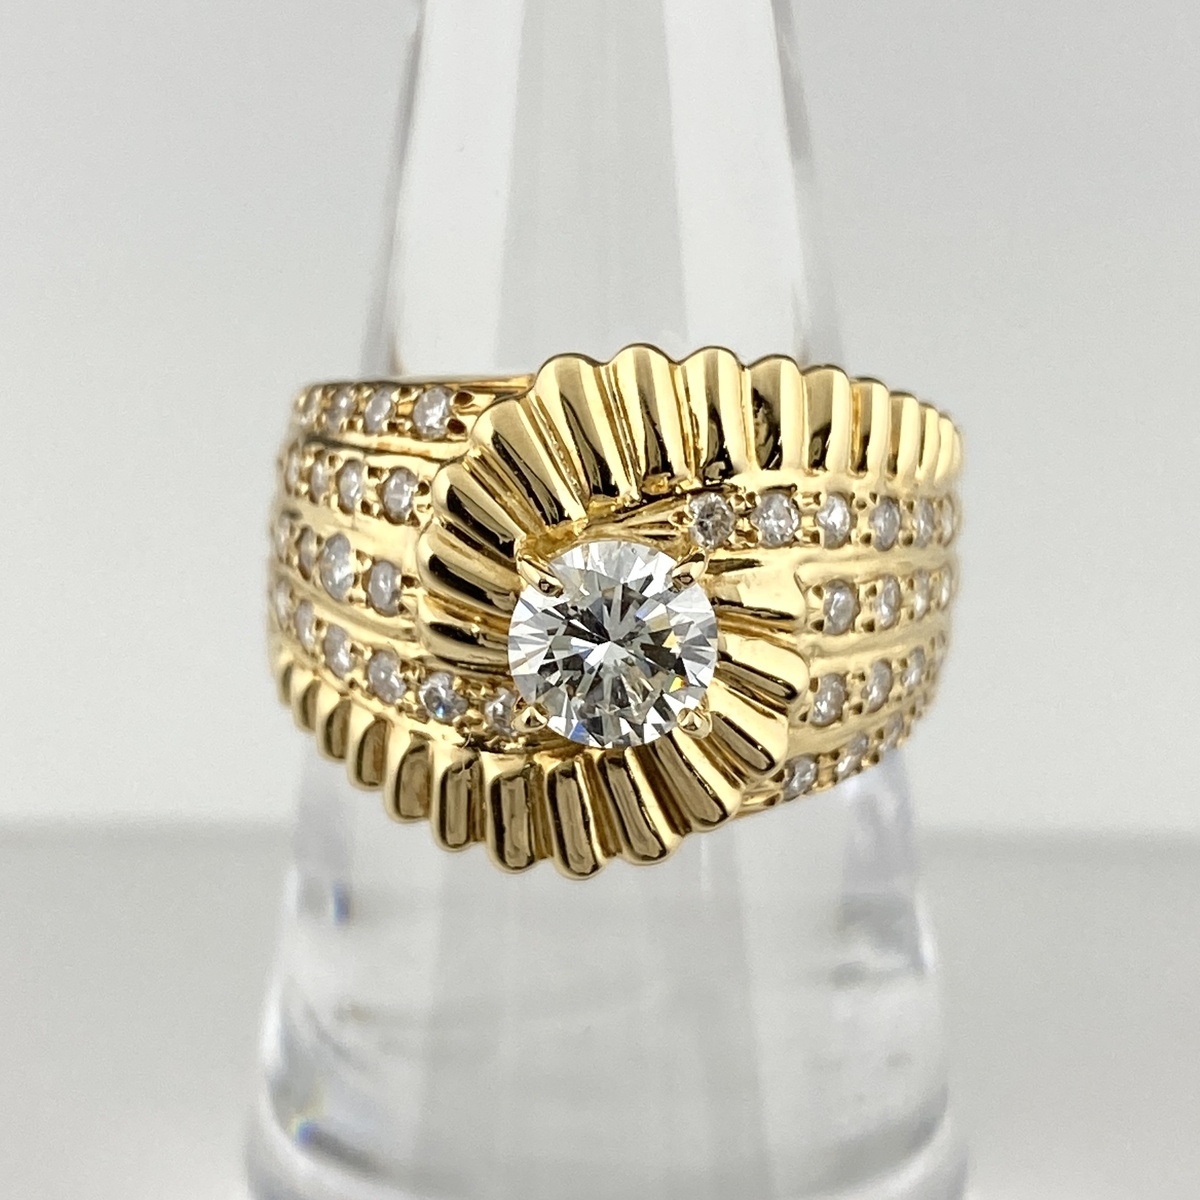 USED 送料無料 ダイヤモンド デザインリング K18 イエローゴールド 中古 レディース 指輪 リング 11号 年間定番 本店 YG